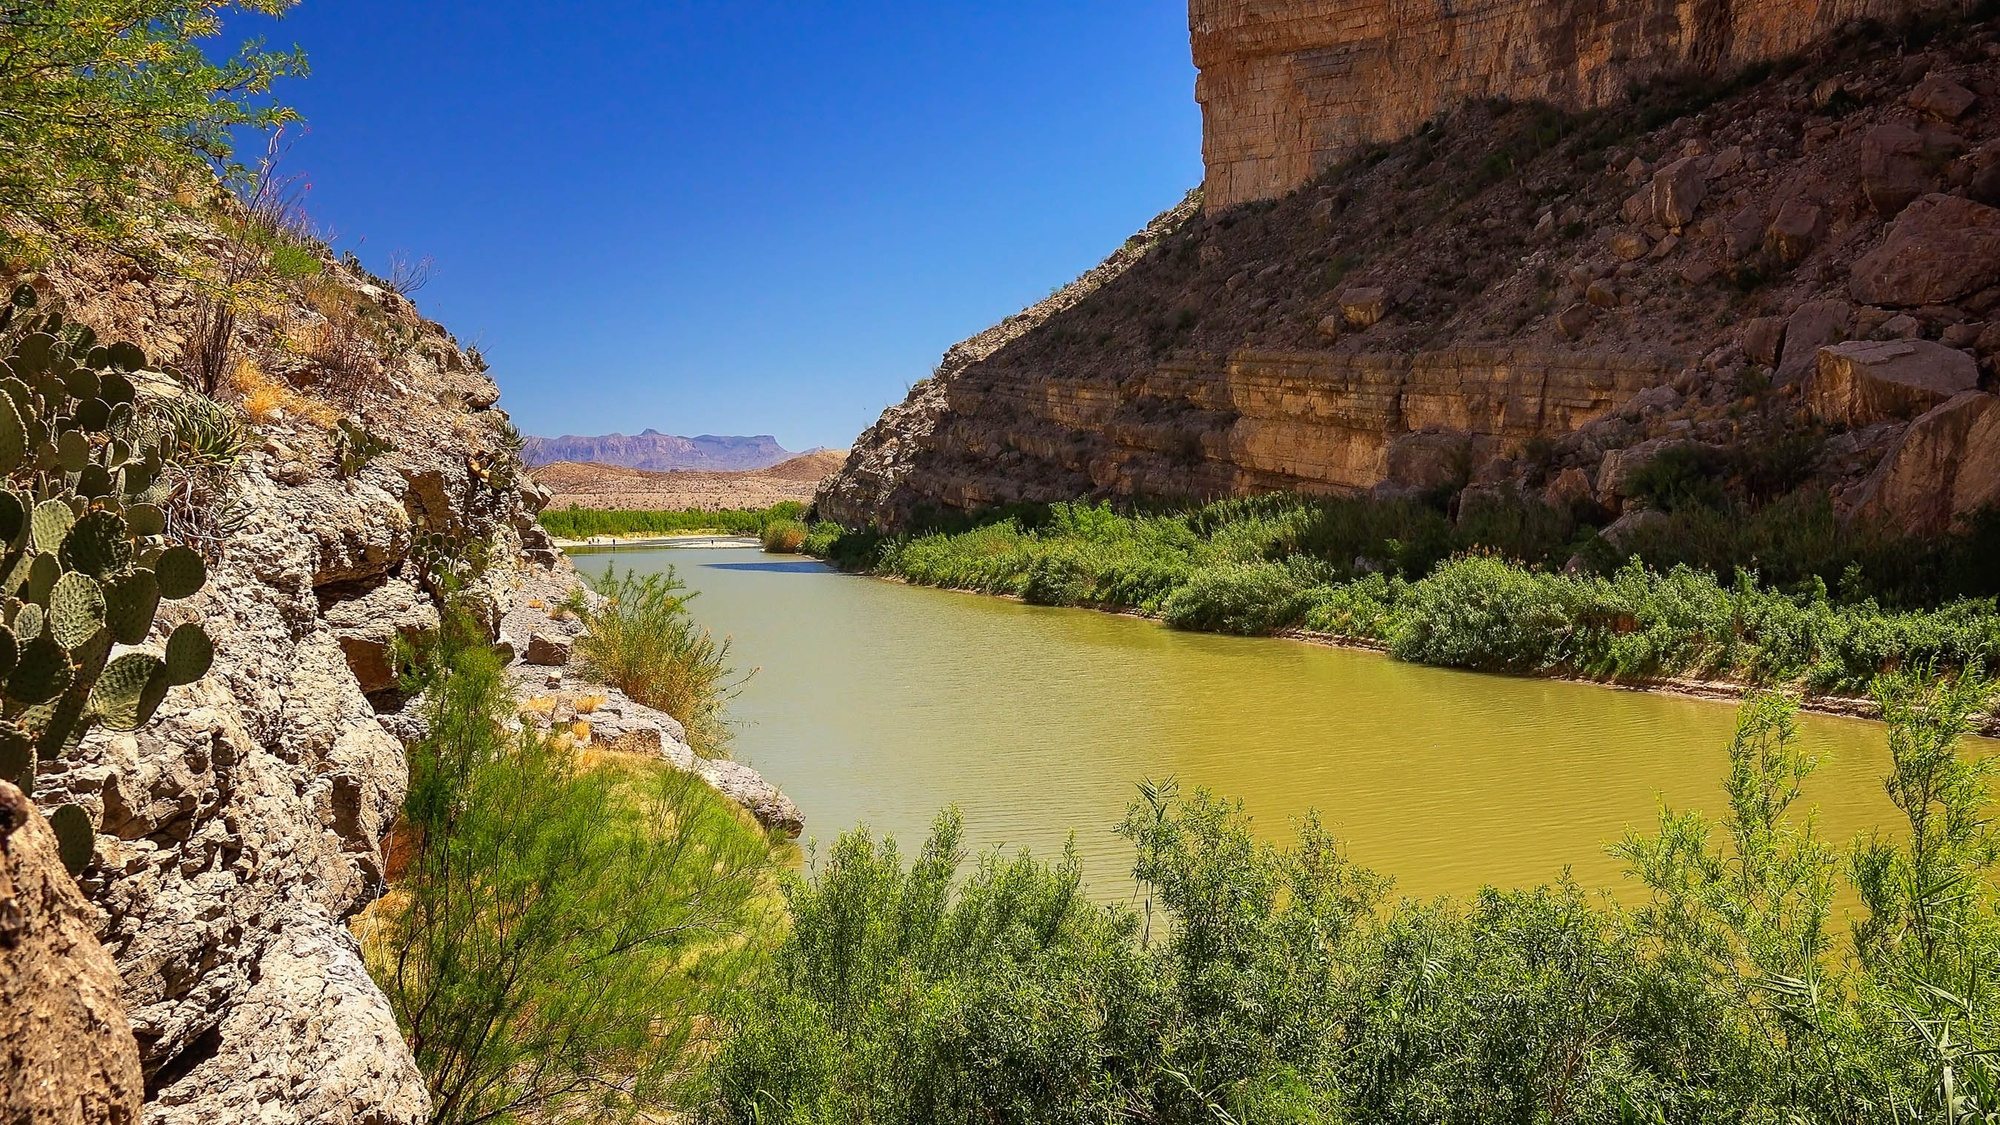 Rio Grande river flowing through Santa Elena Canyon in Big Bend National Park